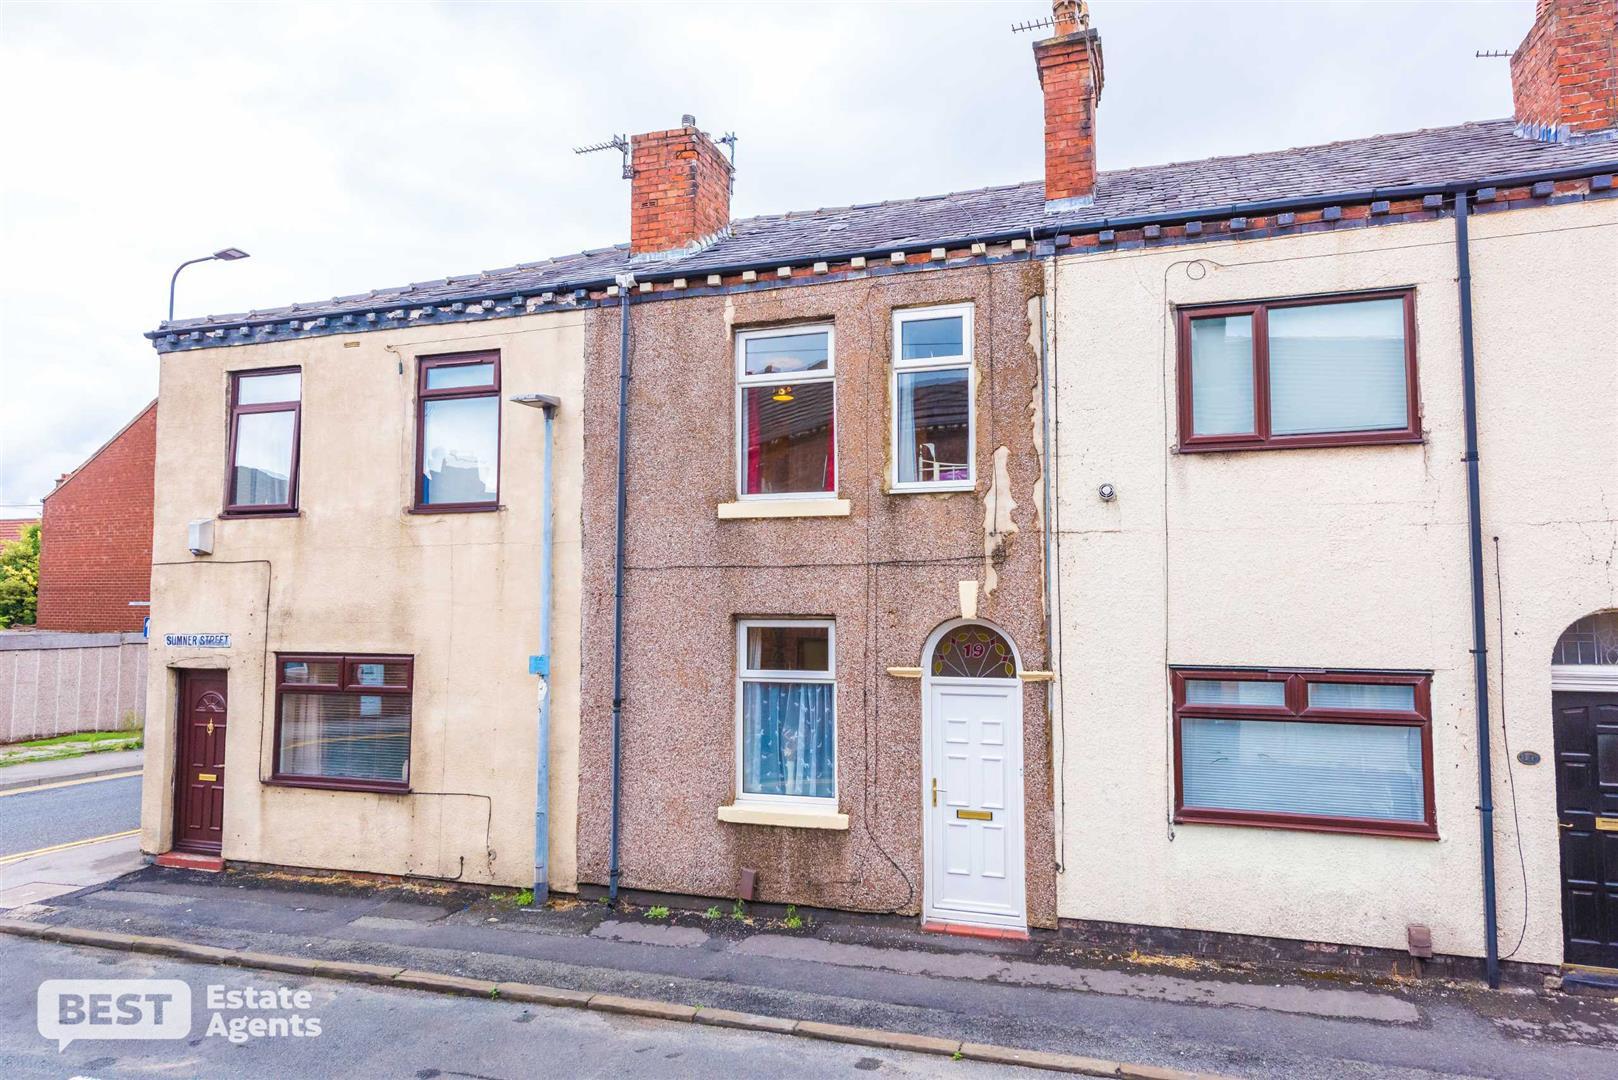 Sumner Street, Atherton, Greater Manchester BEST Estate Agents